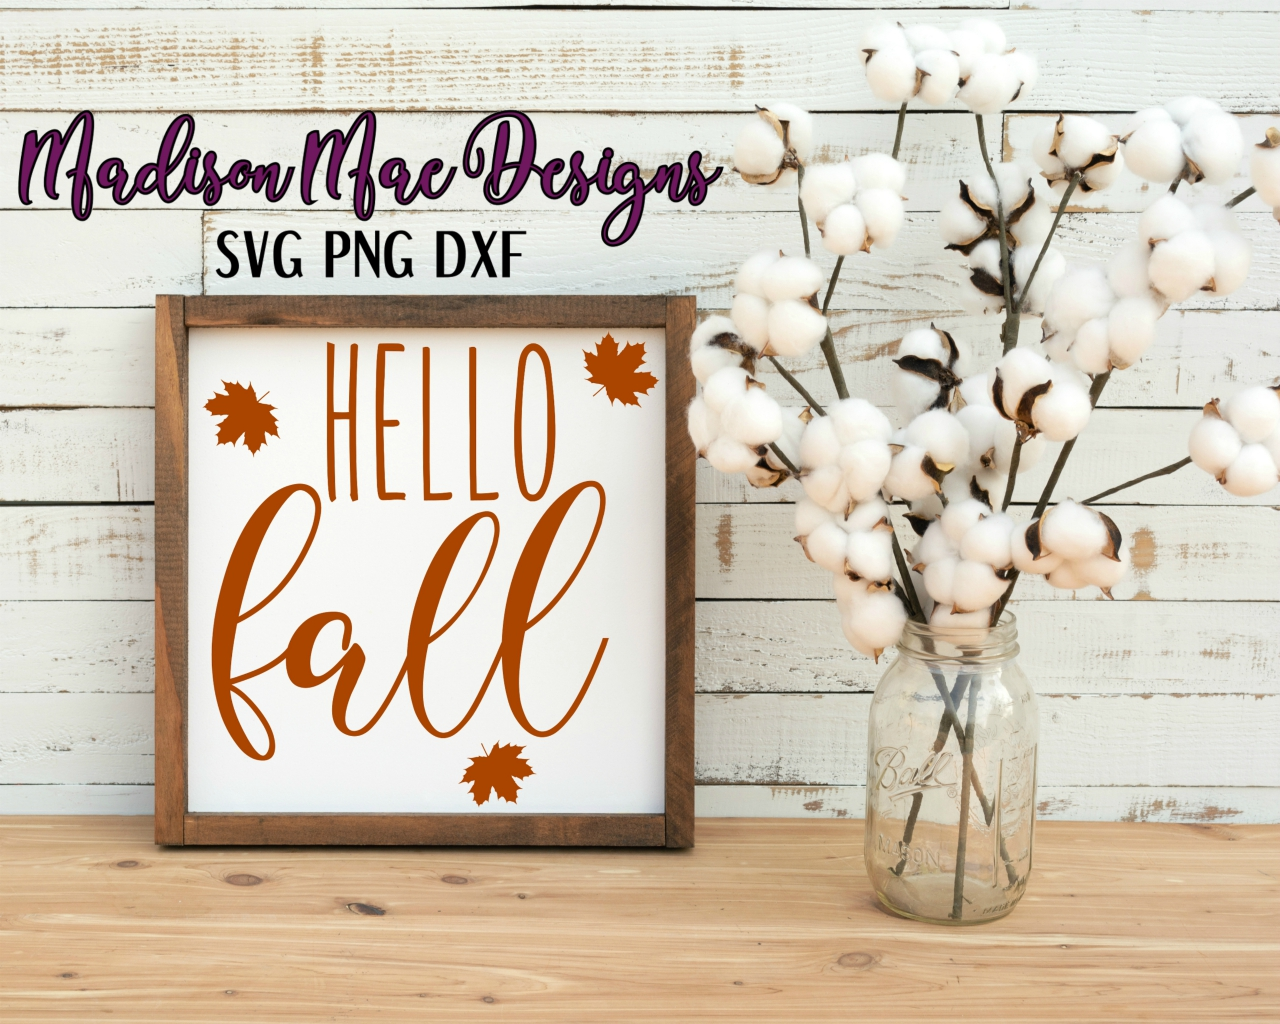 Hello Fall SVG Digital Cut File example image 3